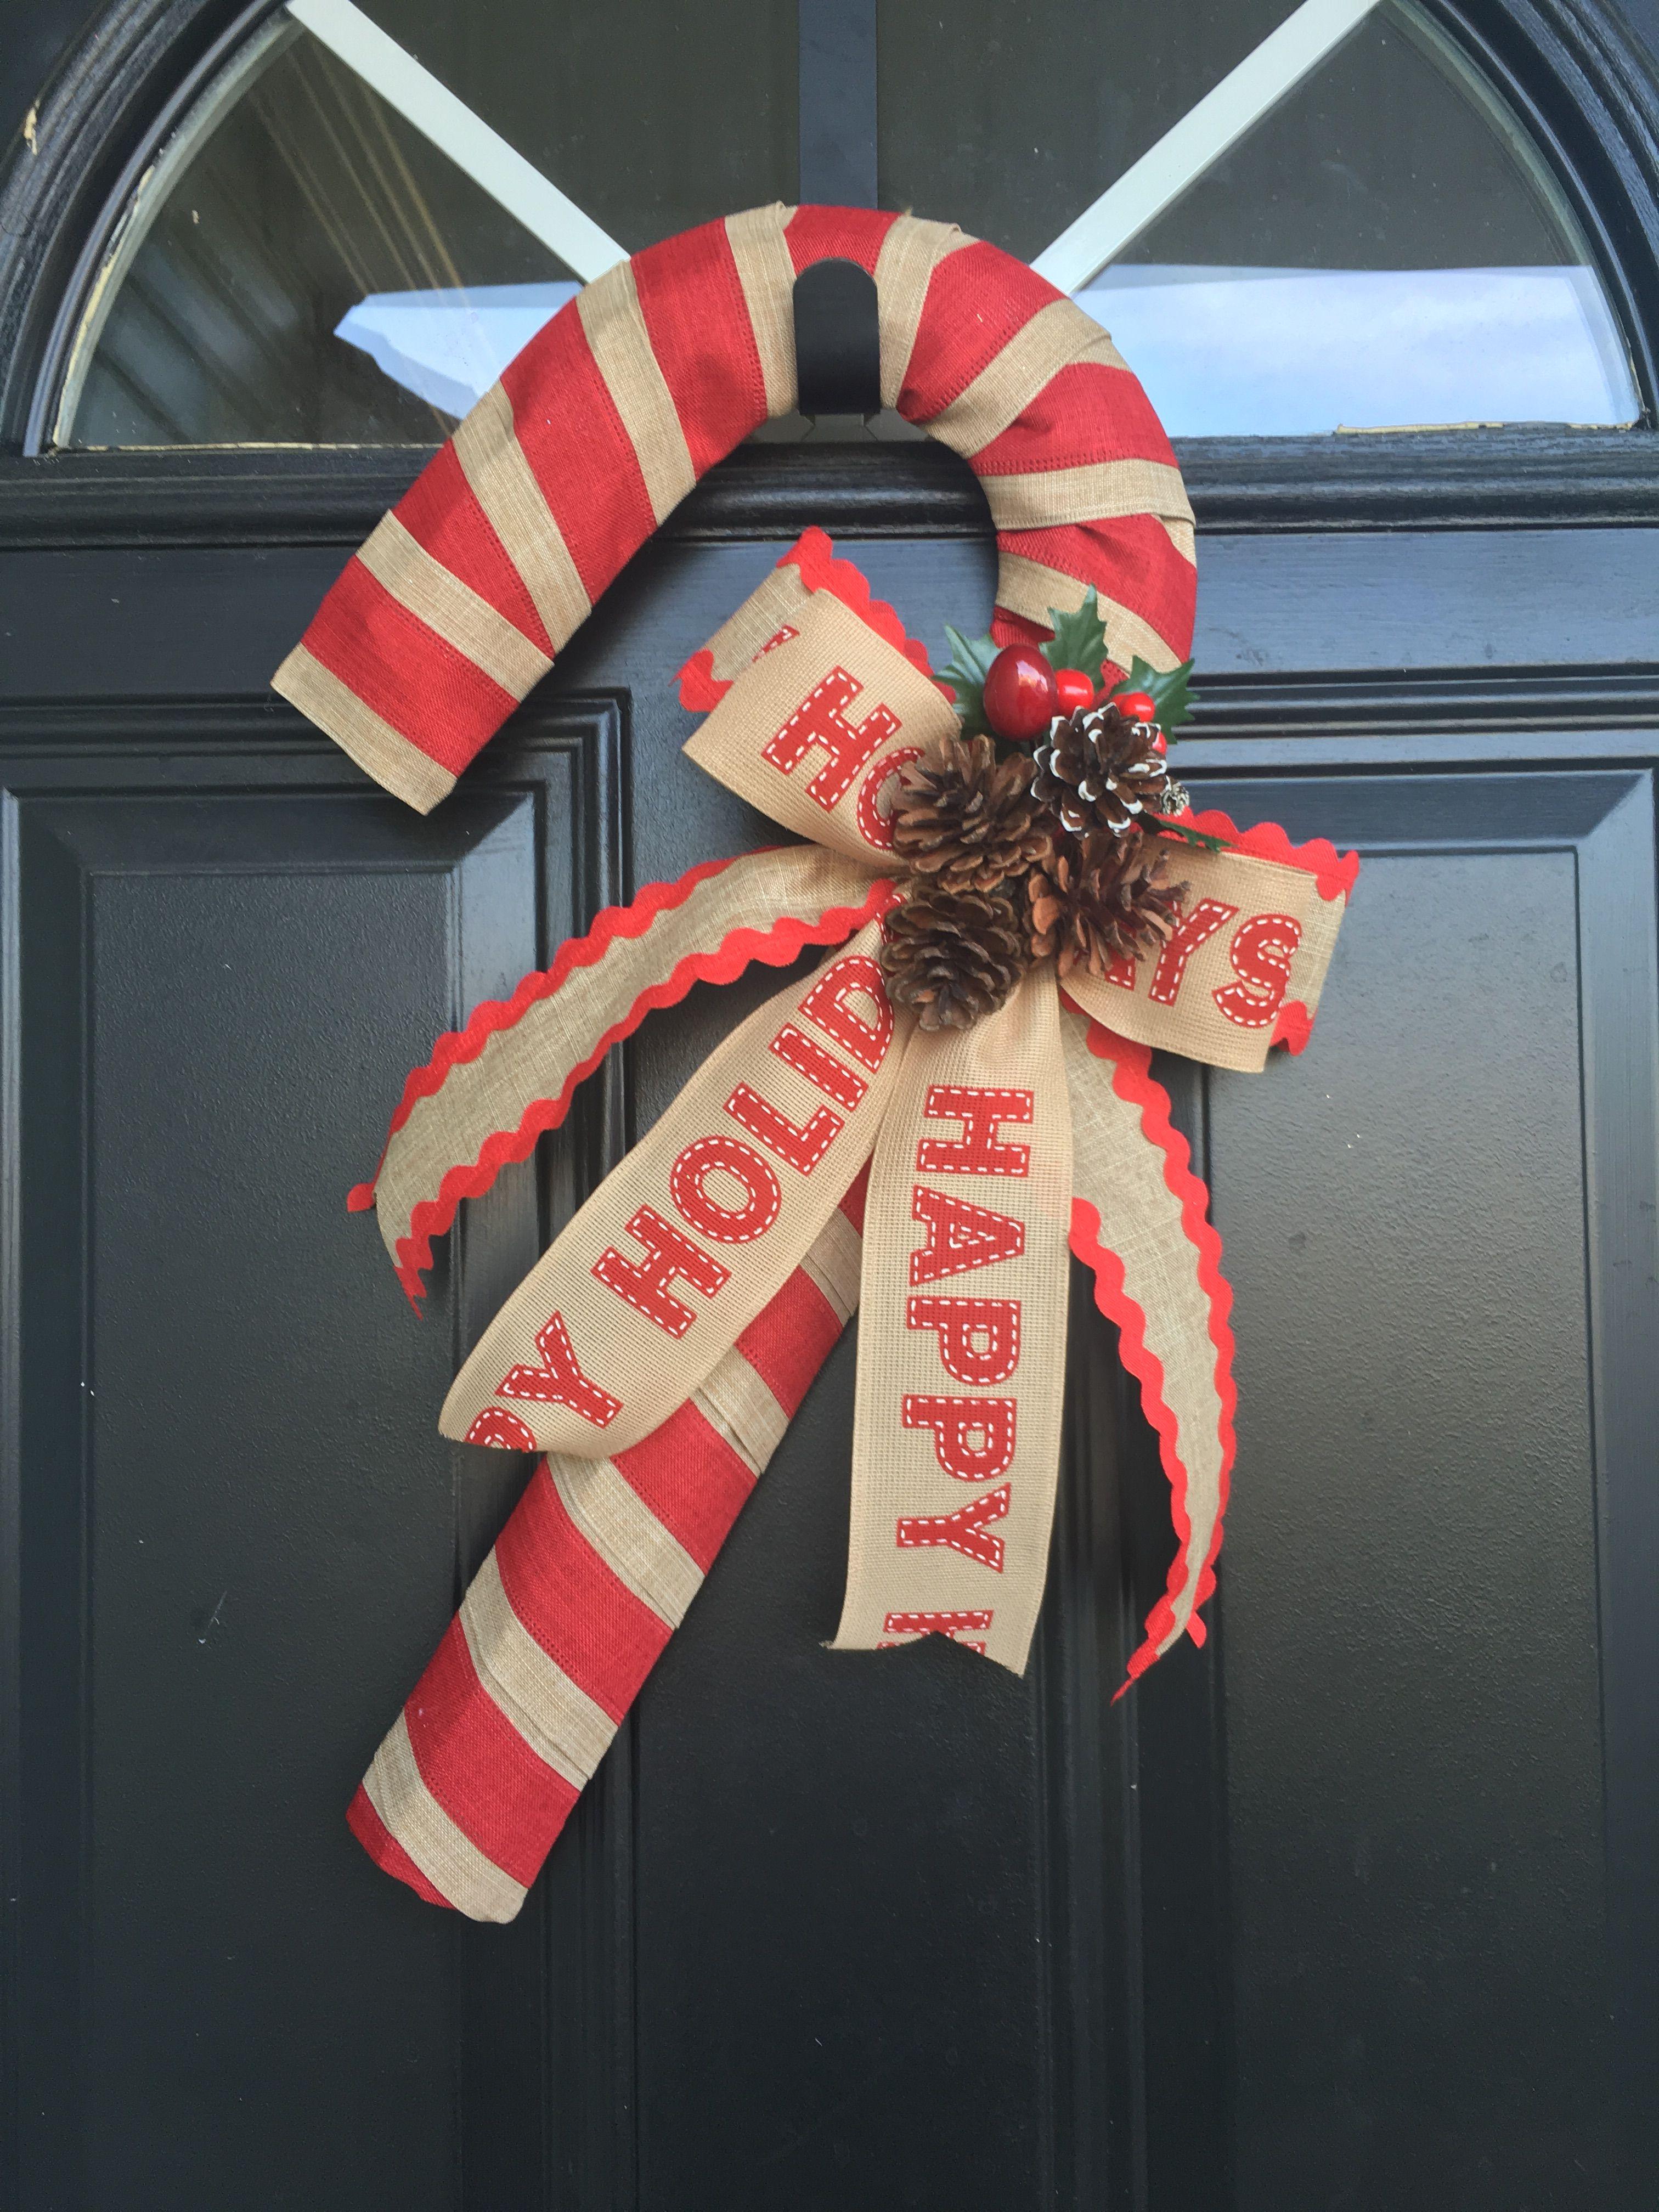 Candy cane shaped wreath. #christmas #ChristmasDecor #ChristmasWreath #candycane #createyboutique   Candy cane wreath. Holiday wreaths. Christmas ...